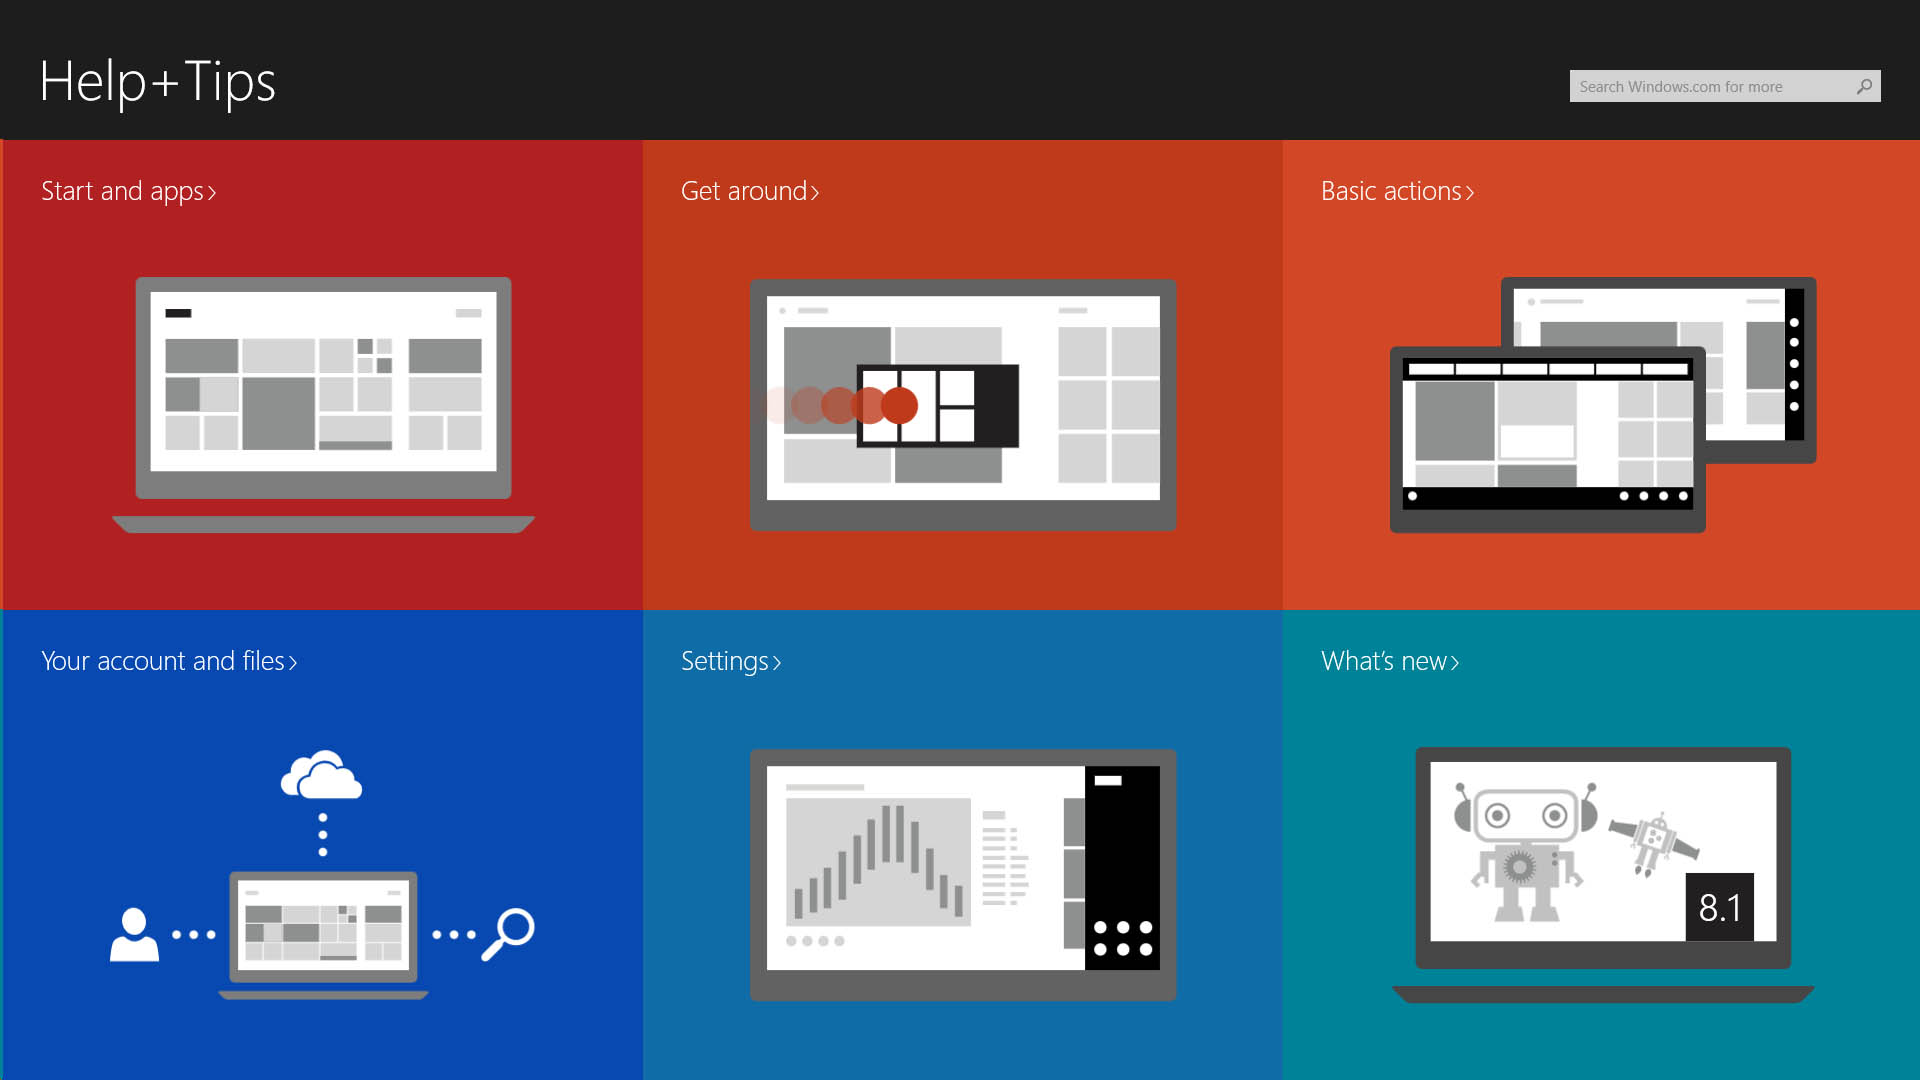 Hot PC Tips - Windows 8.1 Tips